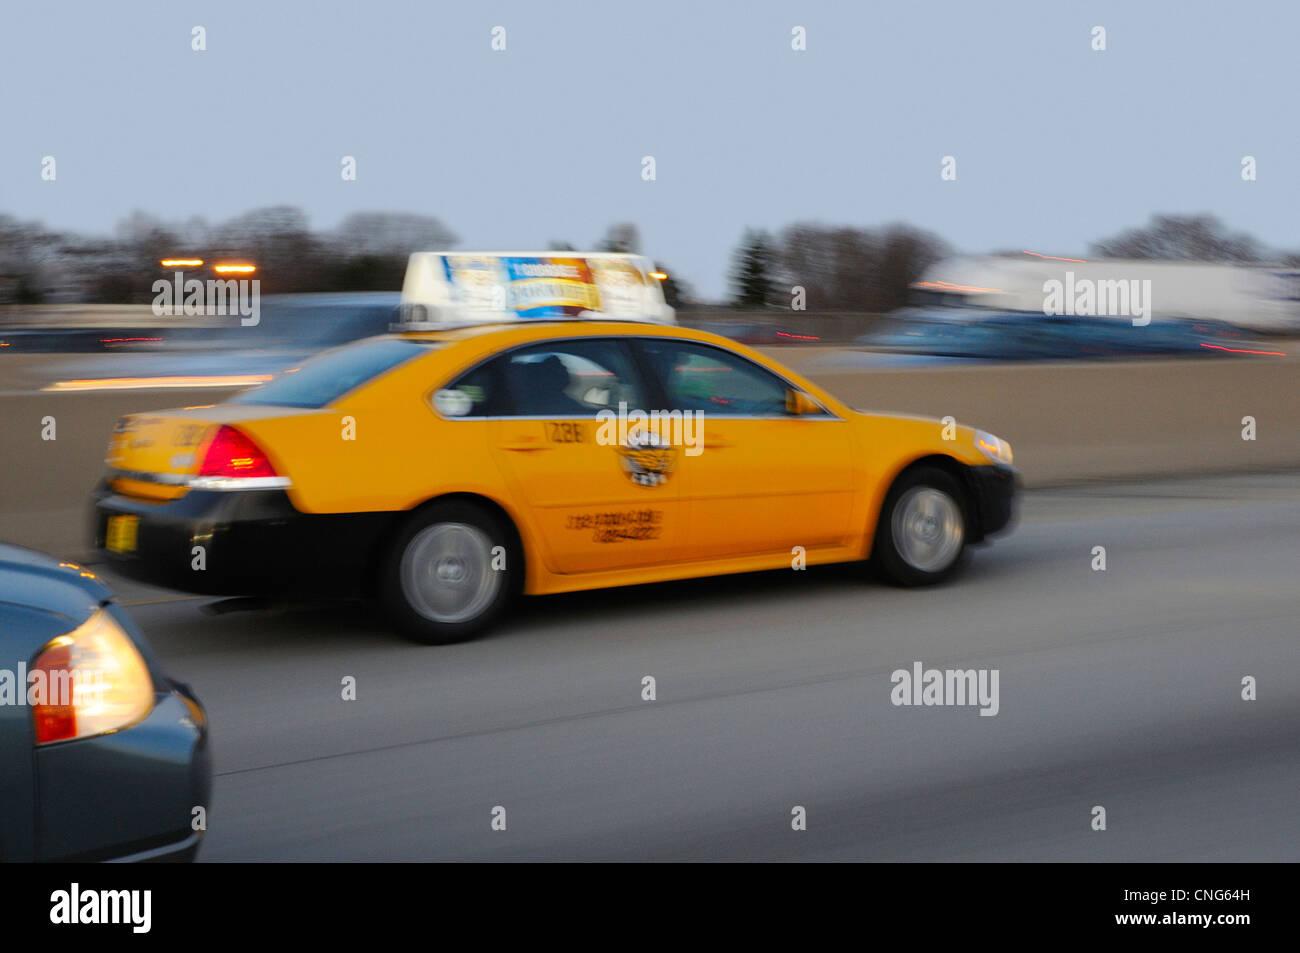 Orange taxicab speeding down expressway at dusk. - Stock Image